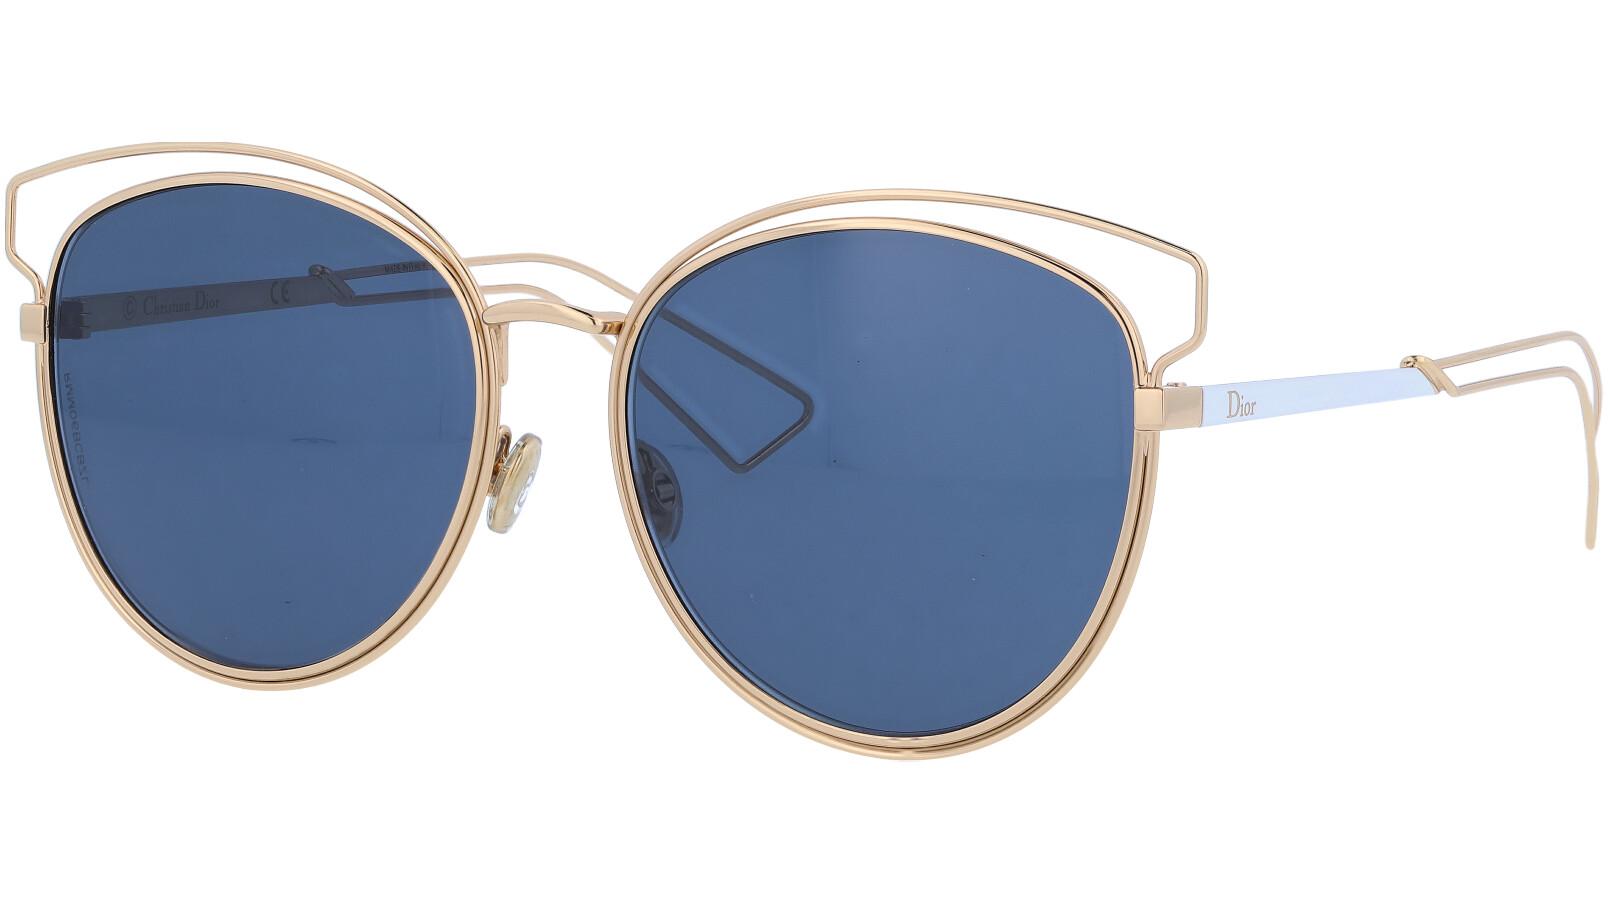 DIOR DIORSIDERAL2 JA00J 56 PINK Sunglasses